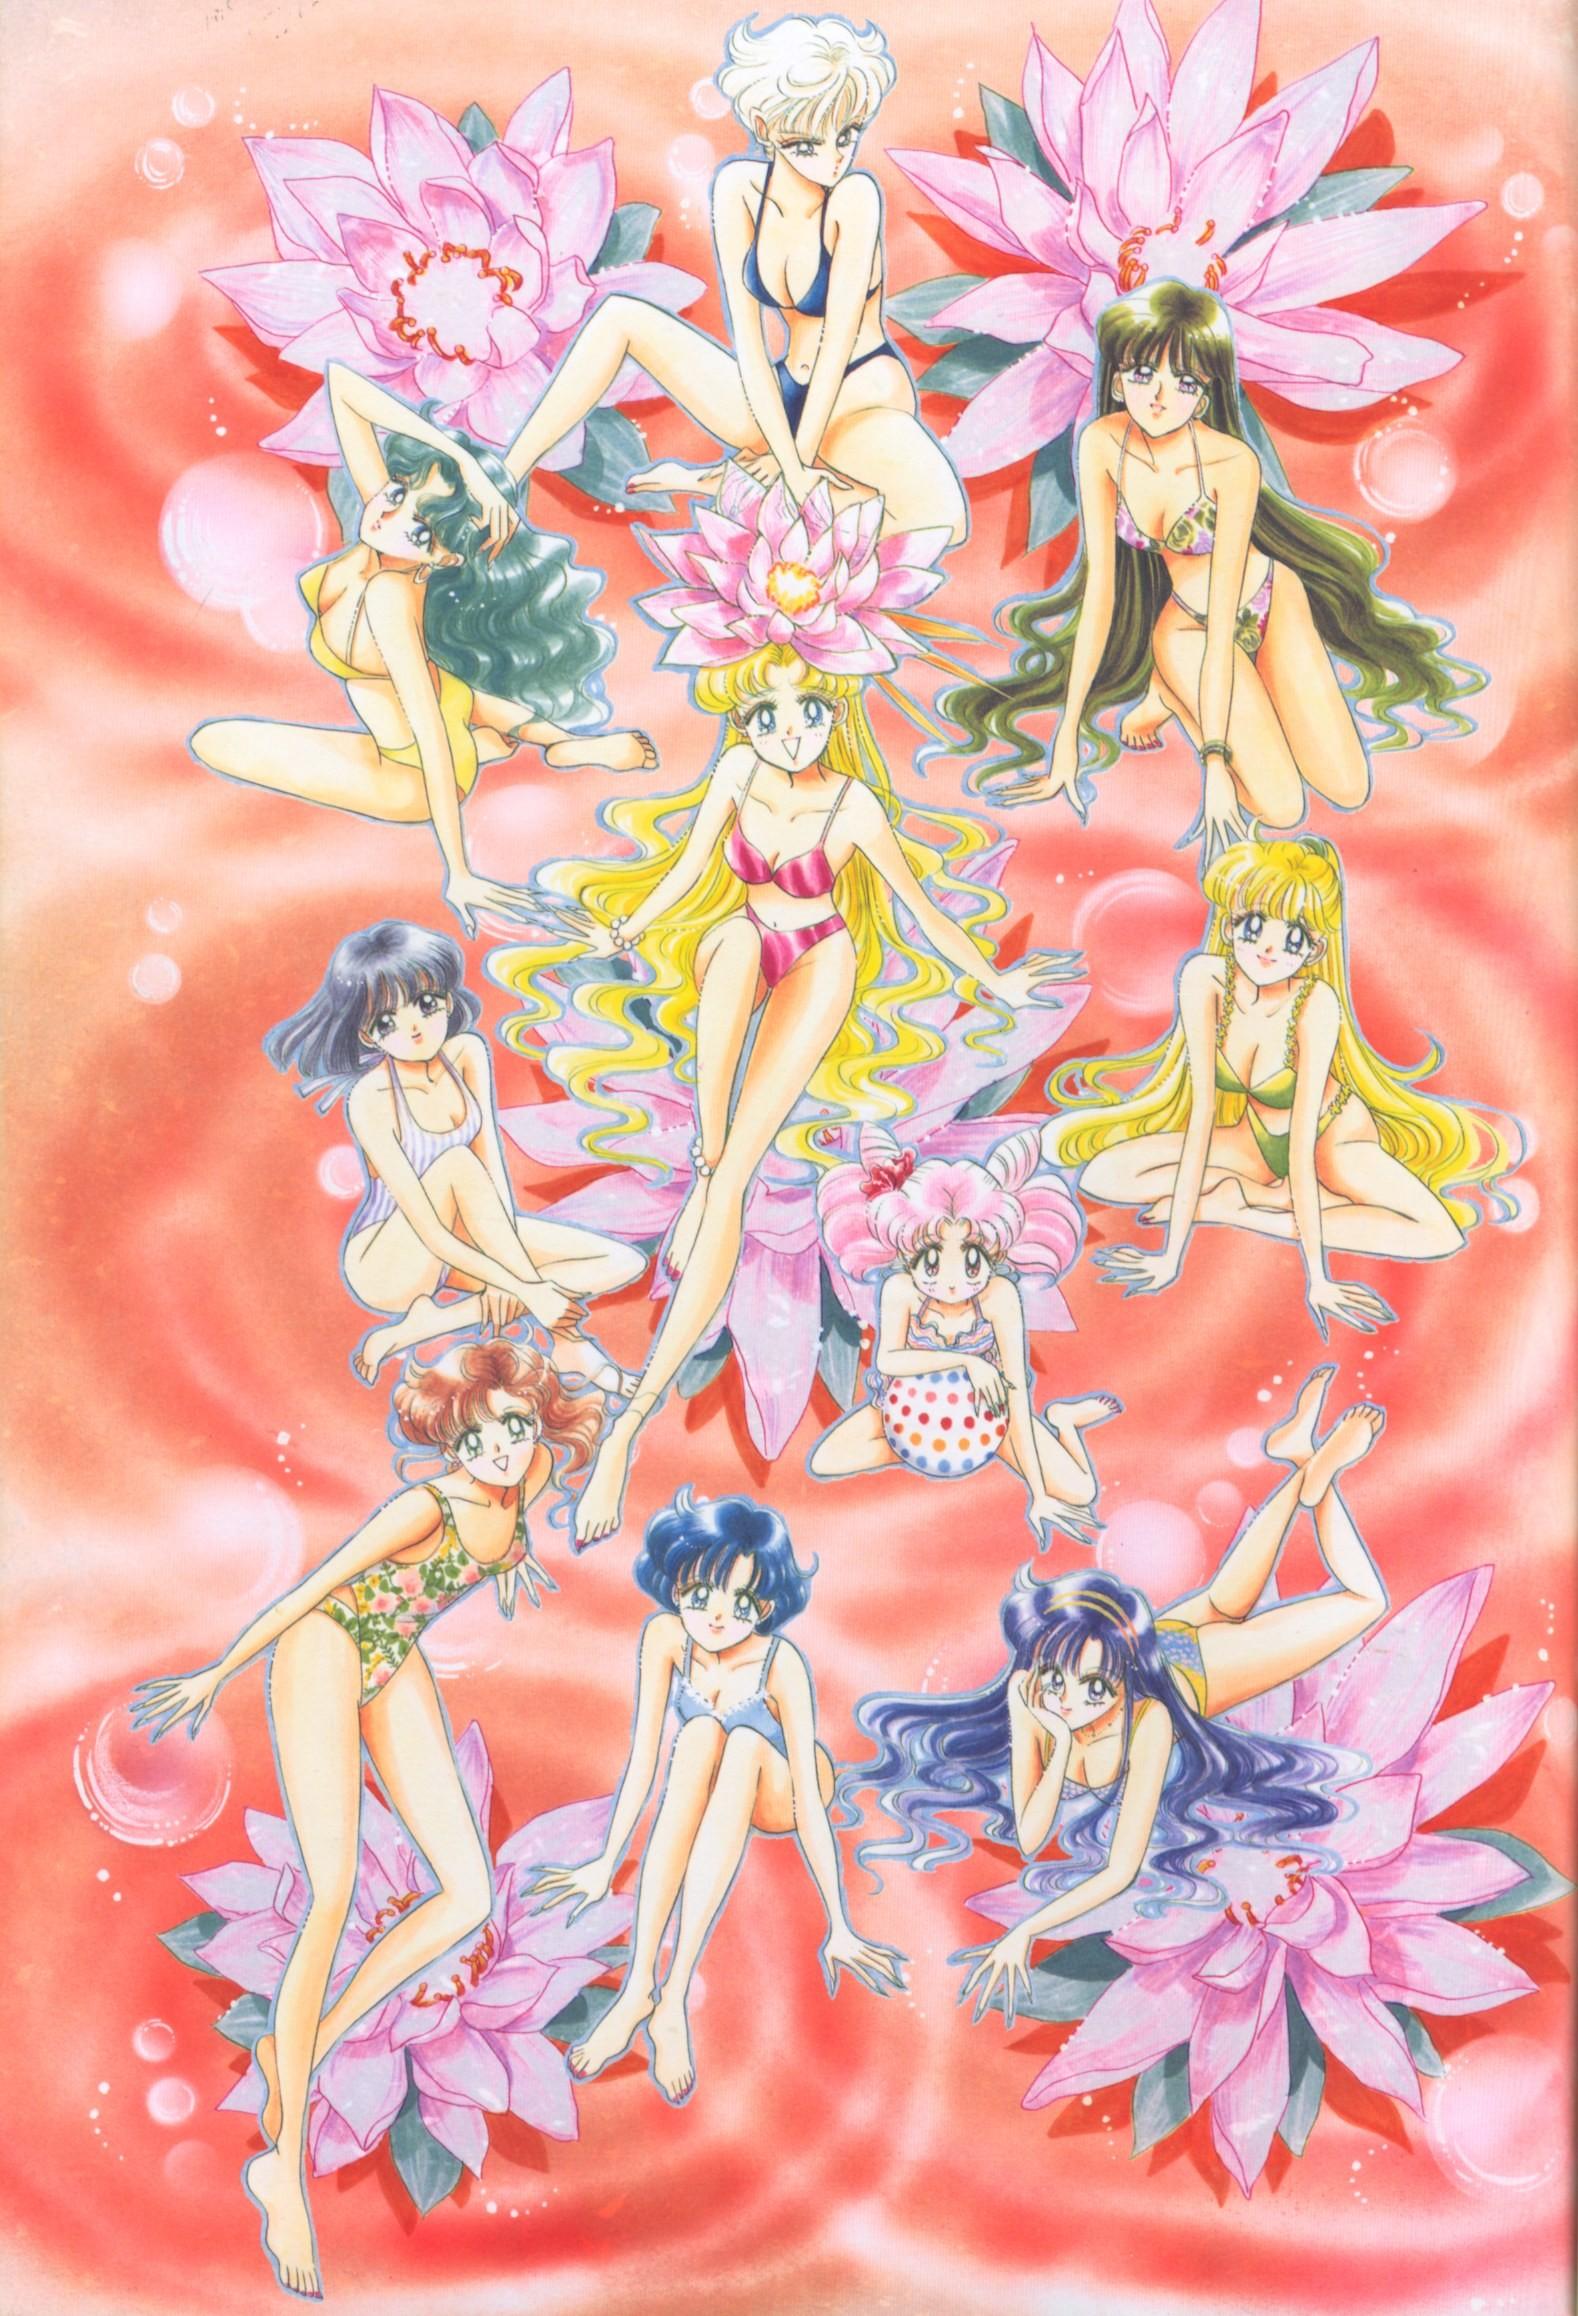 Bishoujo Senshi Sailor Moon Original Picture Collection Vol. IV   Manga  Style!